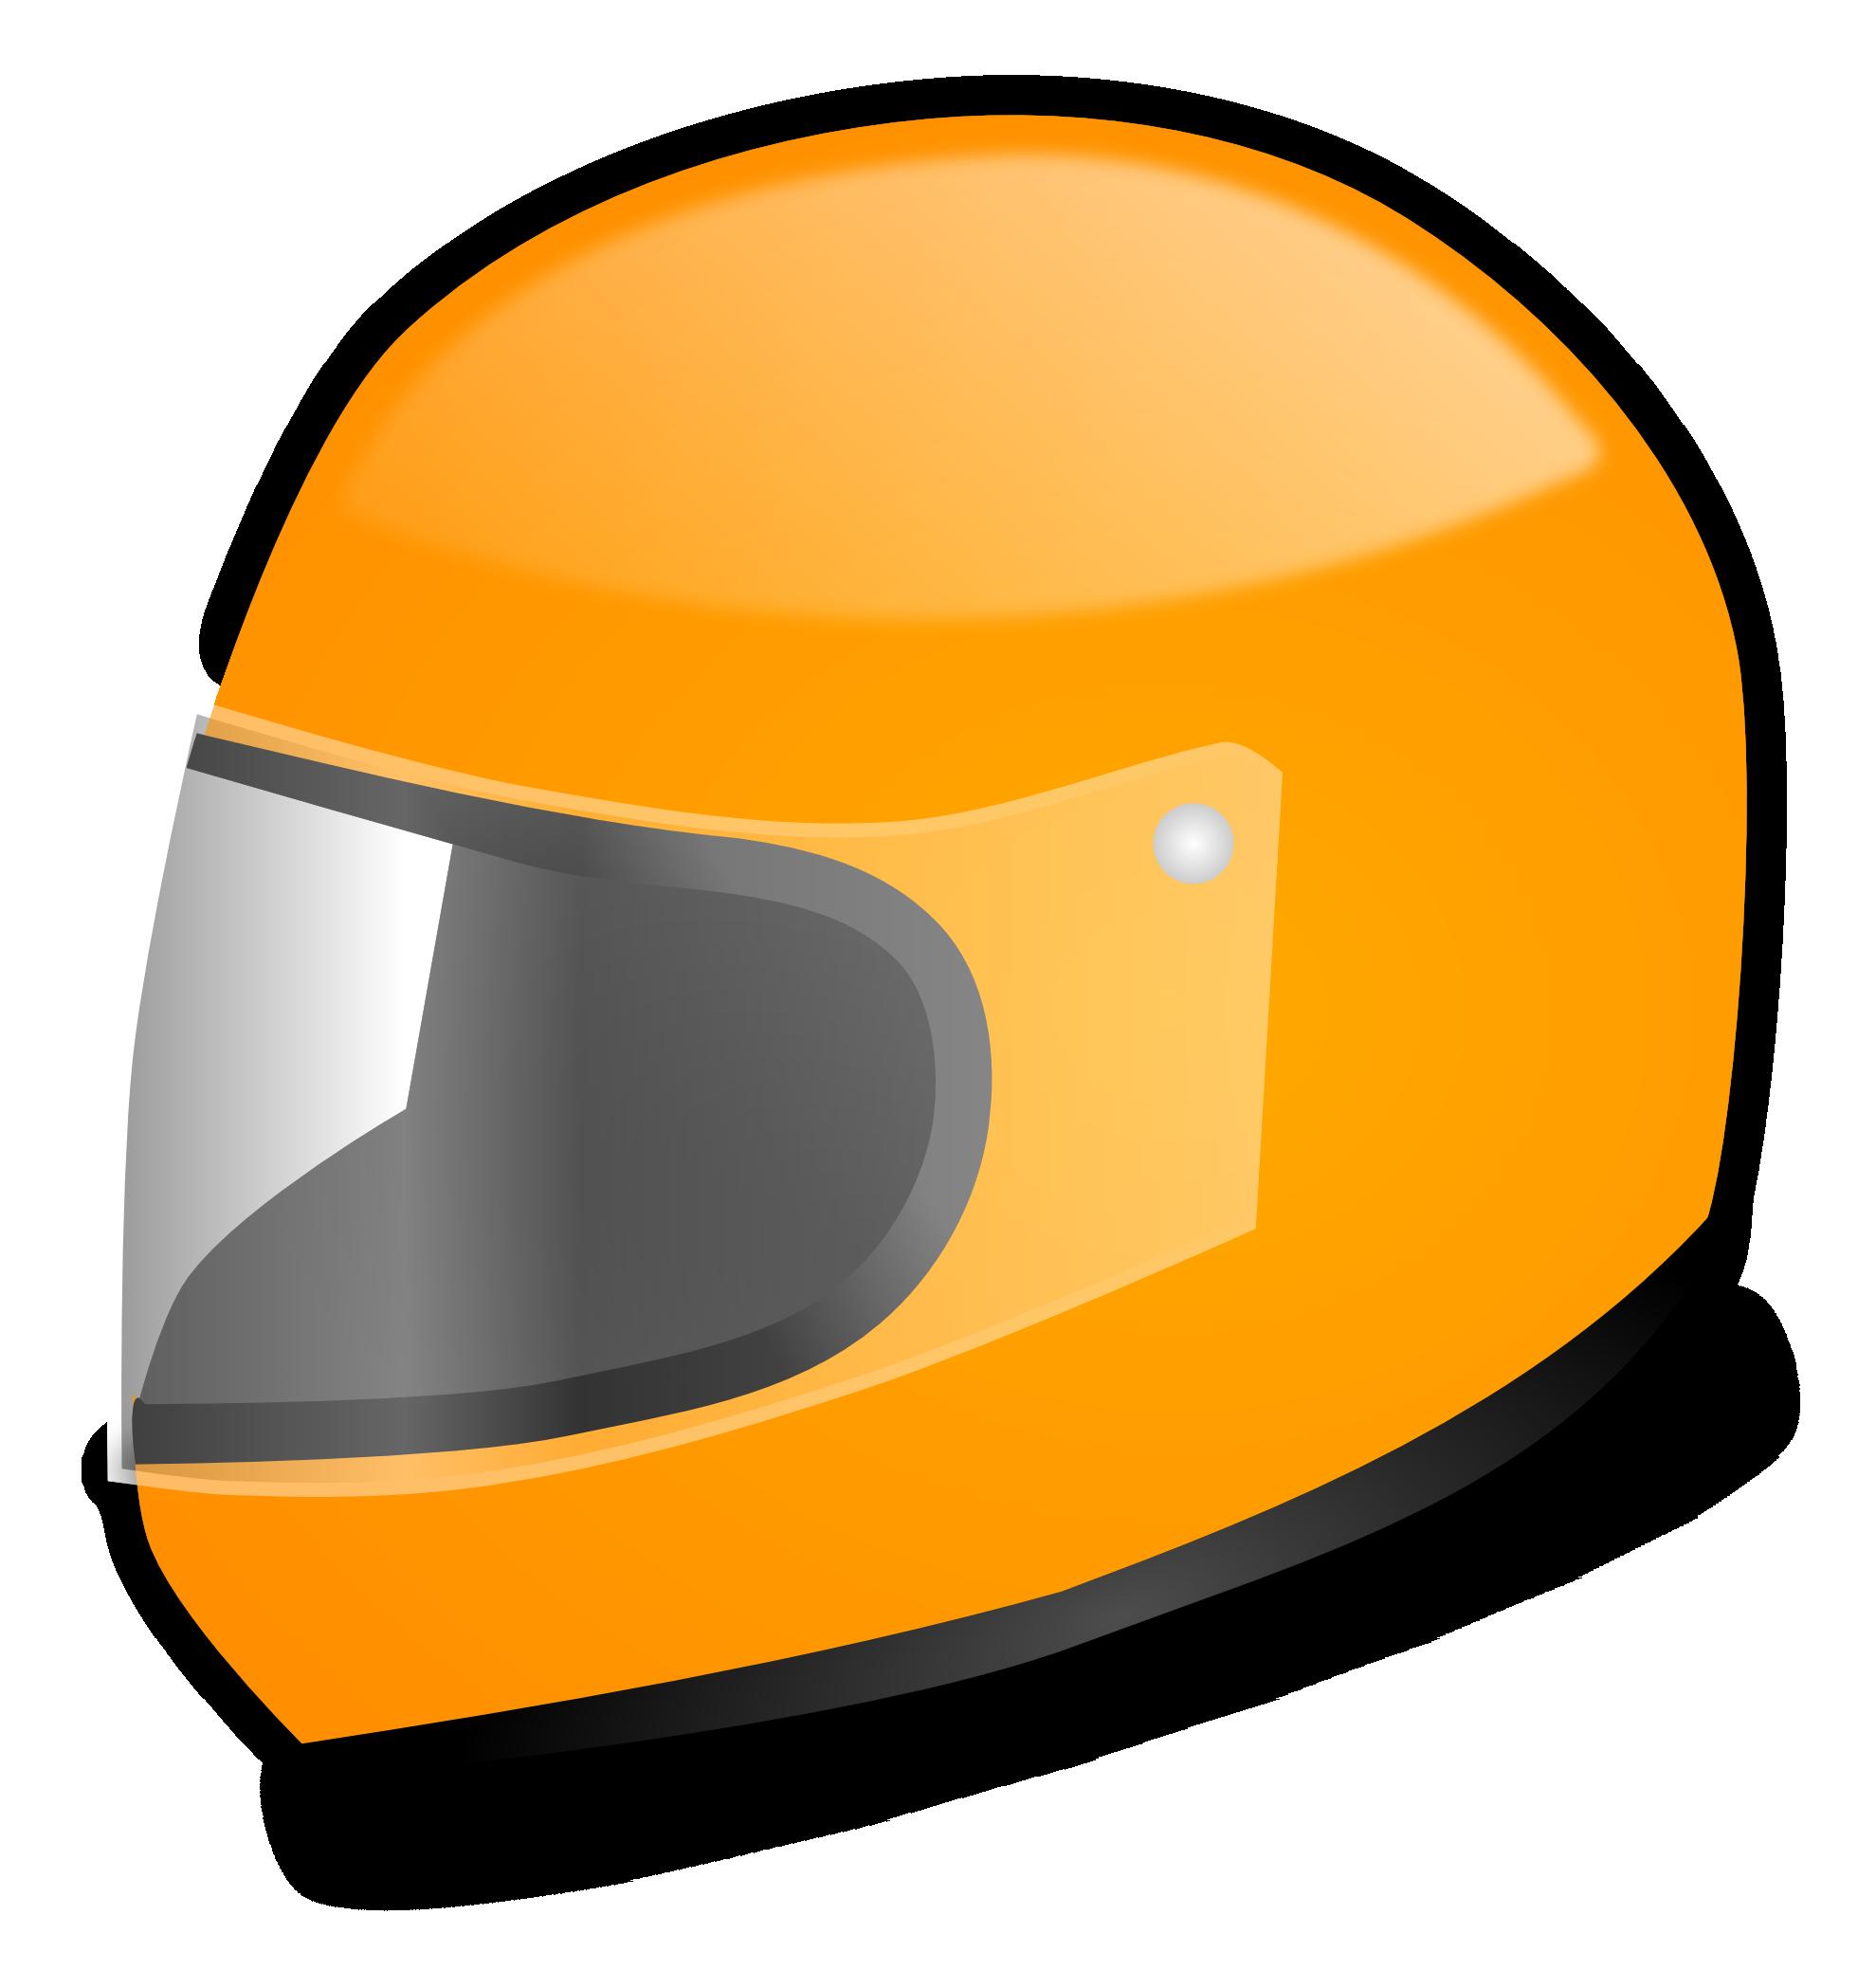 Pencil and in color. Helmet clipart motorbike helmet